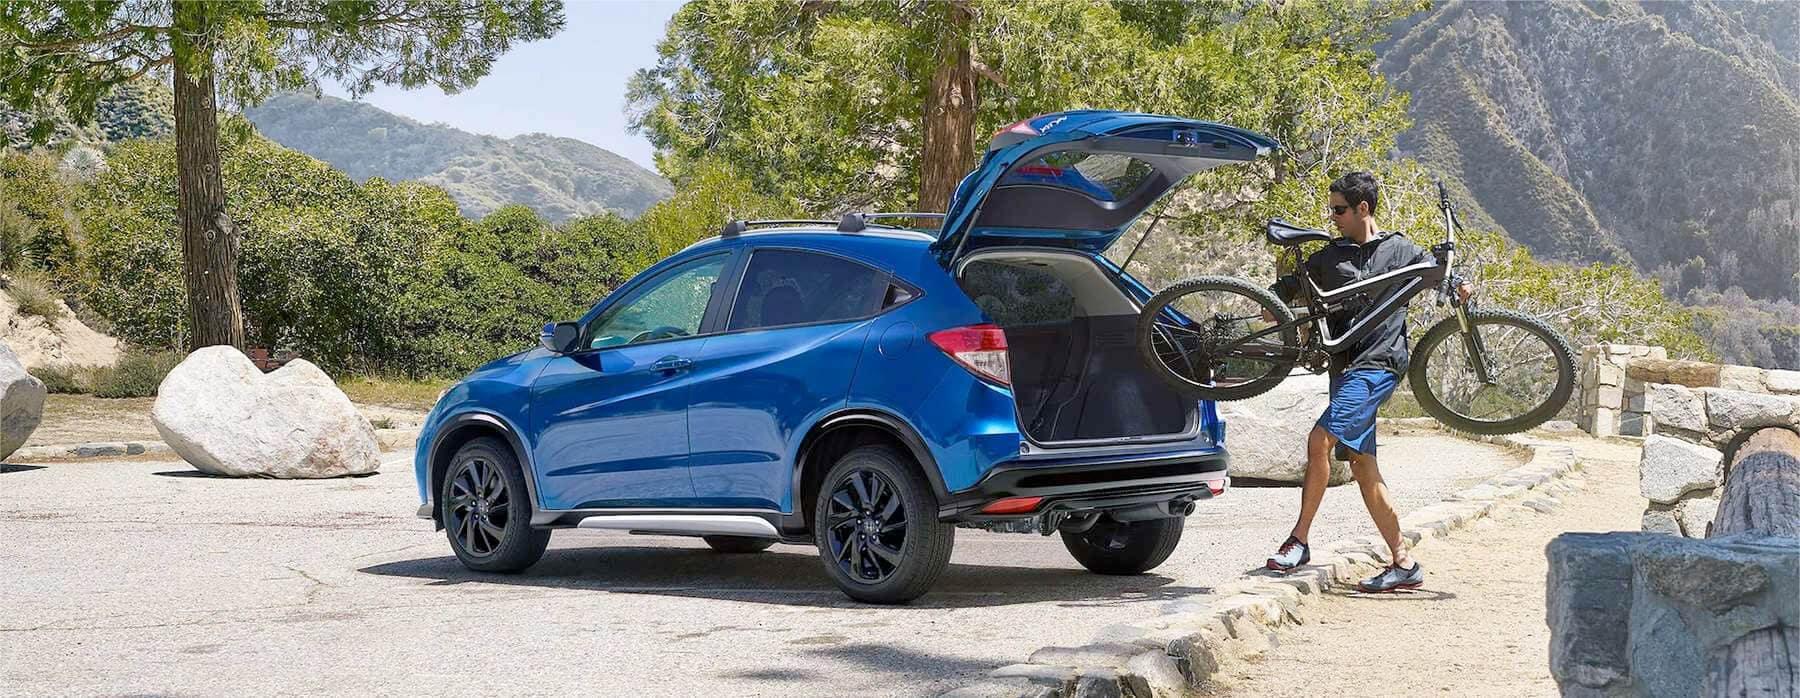 Introducing the 2021 Honda HR-V Vern Eide Honda Sioux City Slider